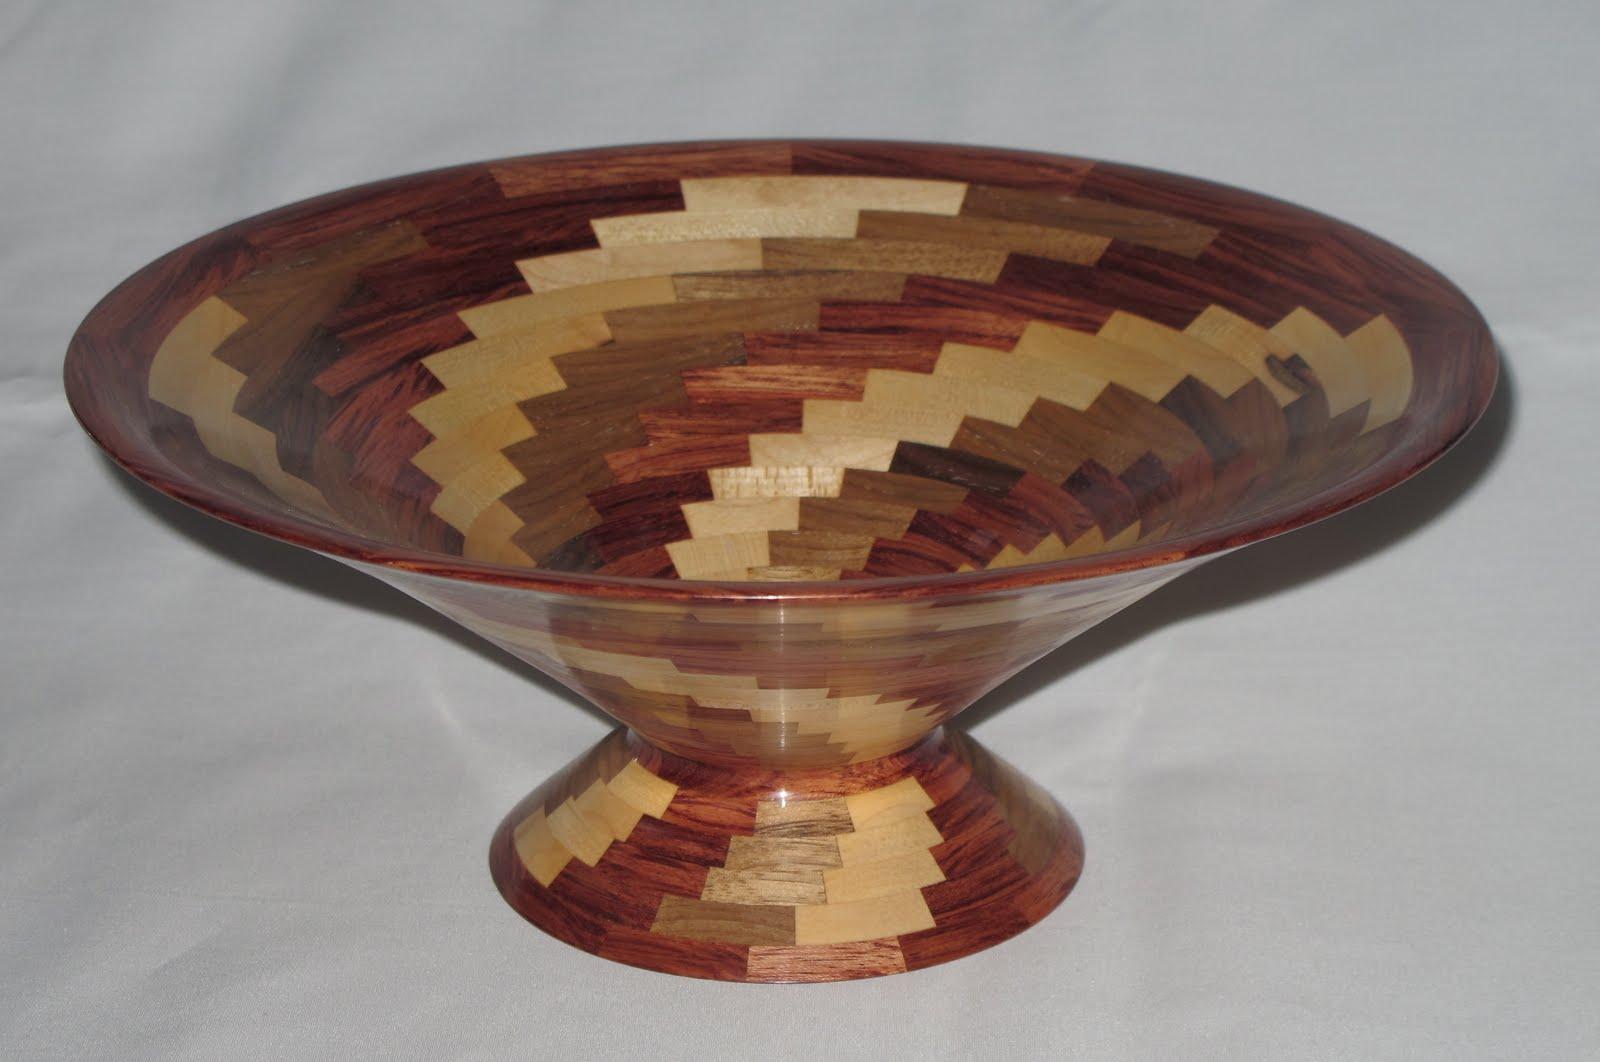 Segmented Wooden Vases Amp Bowls Segmented Maple Walnut